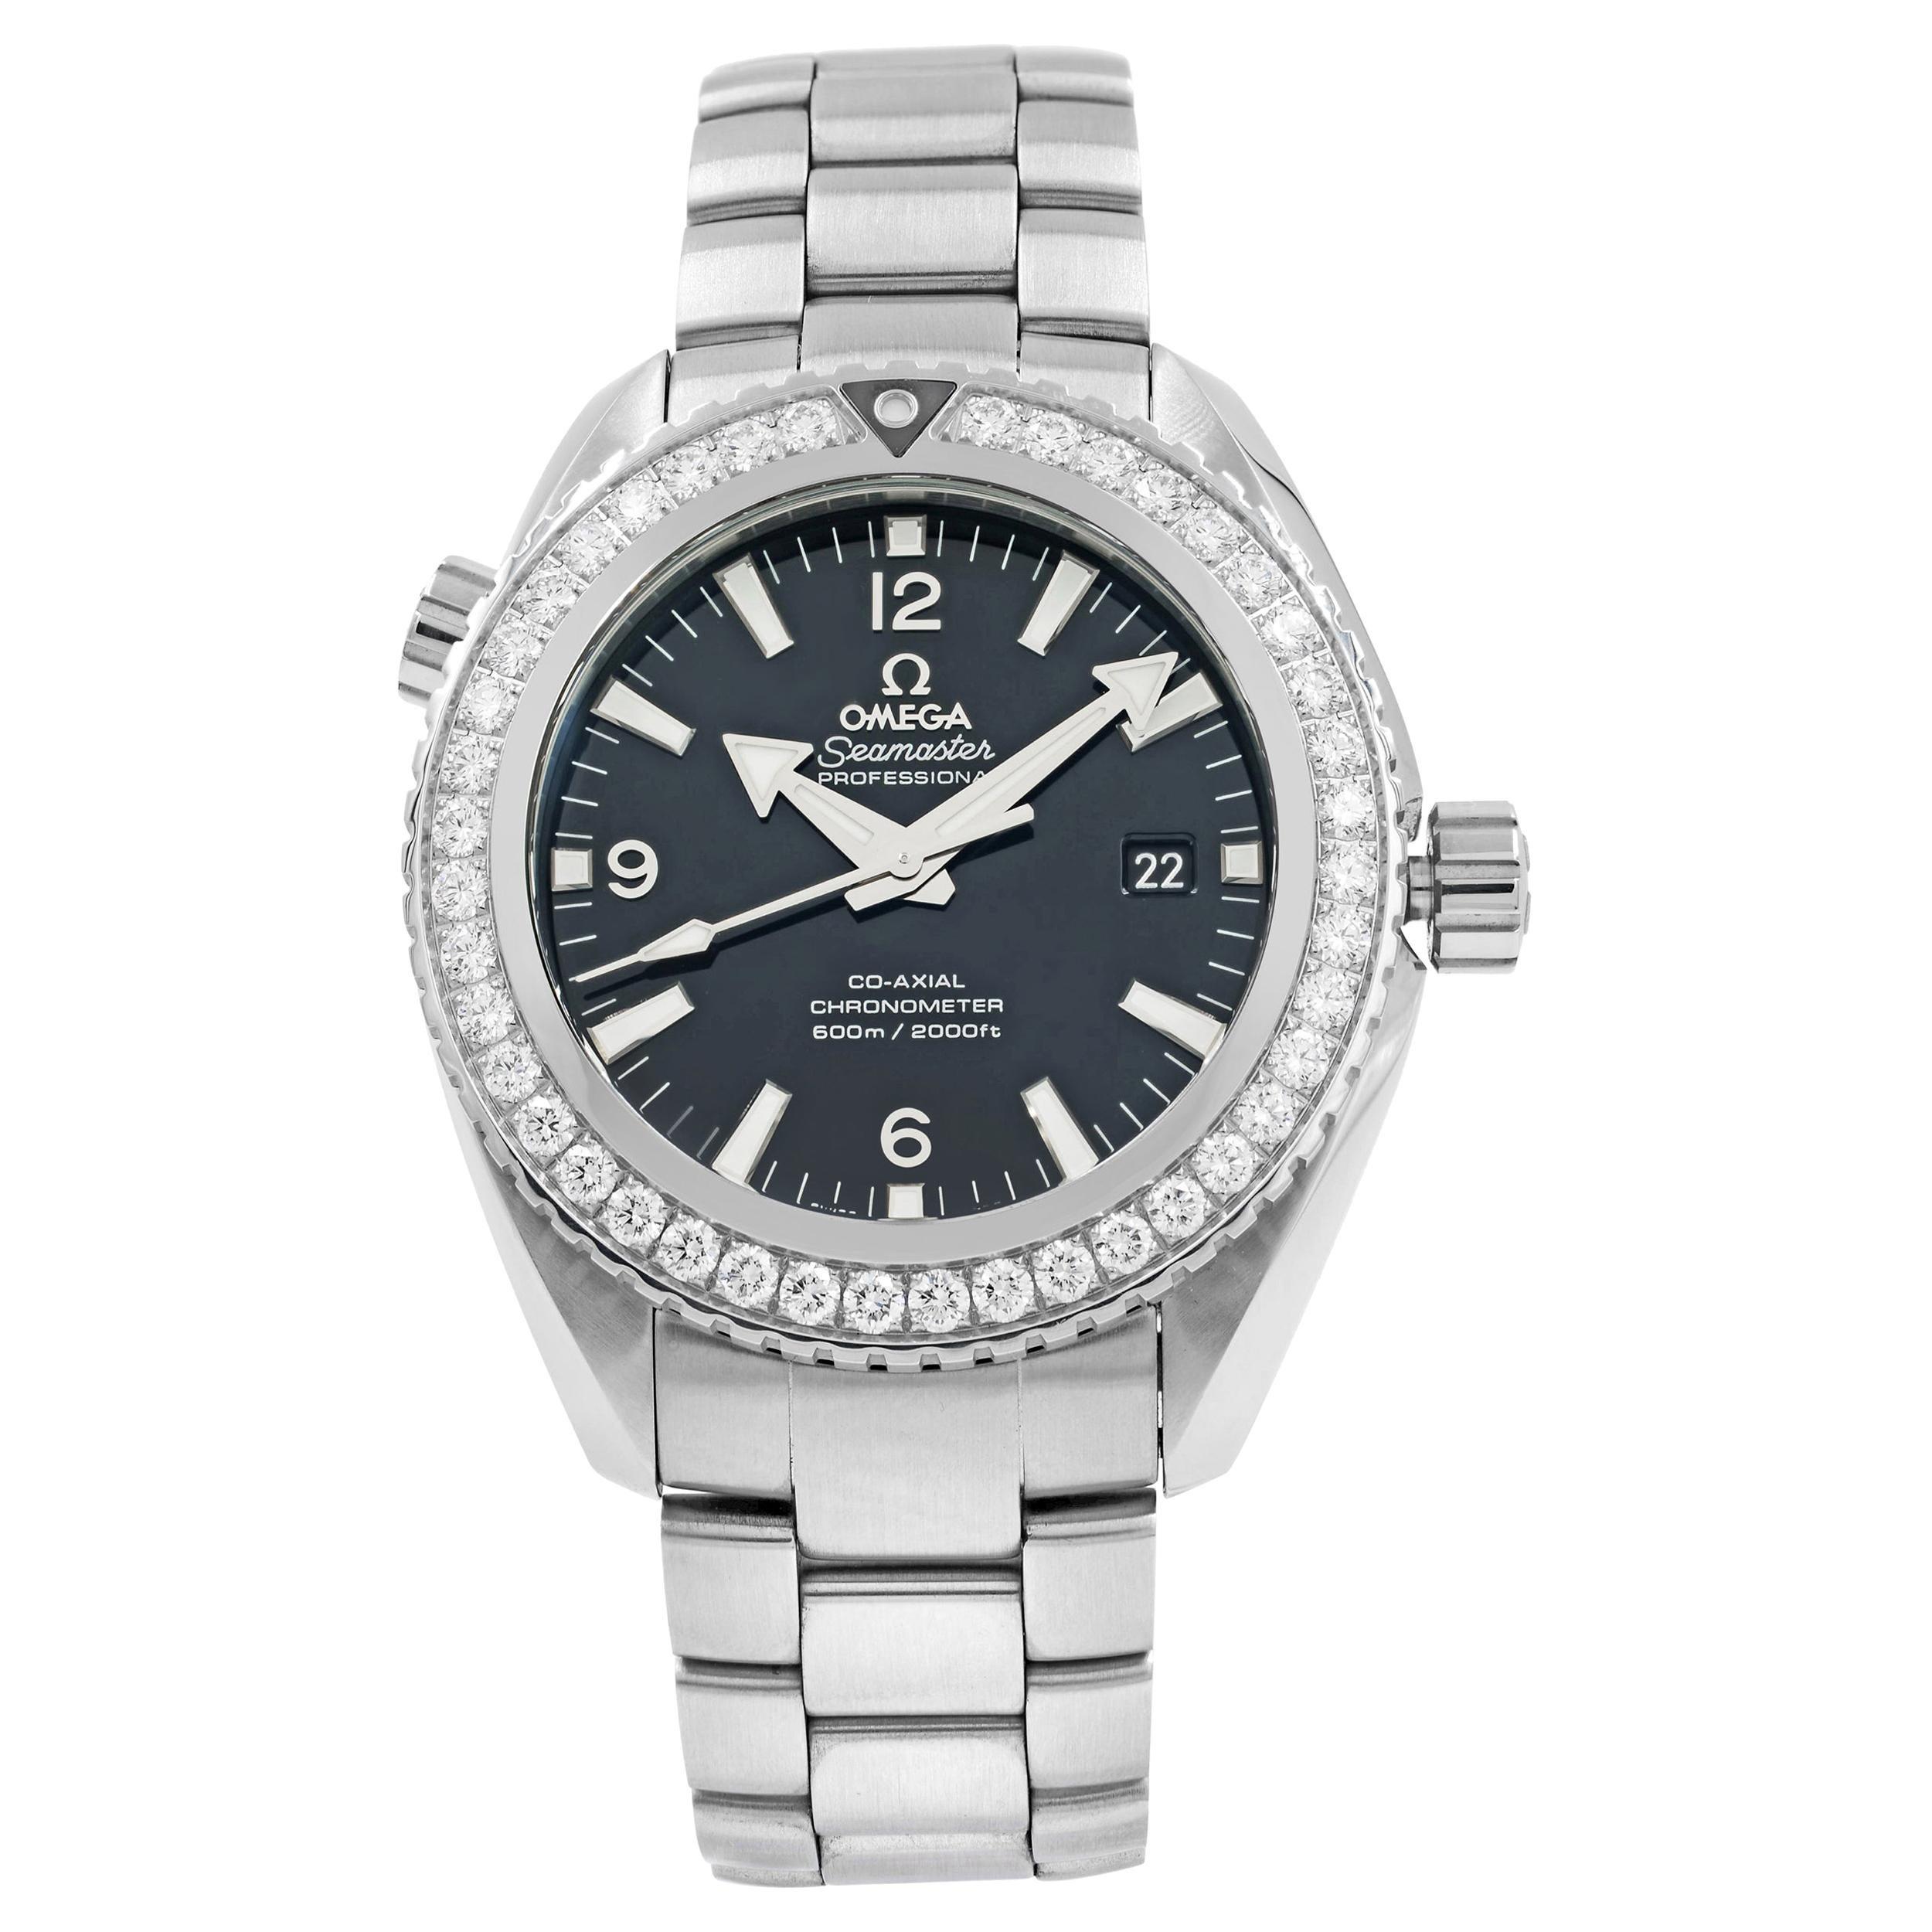 Omega Seamaster Planet Ocean Titanium Diamond Men's Watch 232.15.46.21.01.001